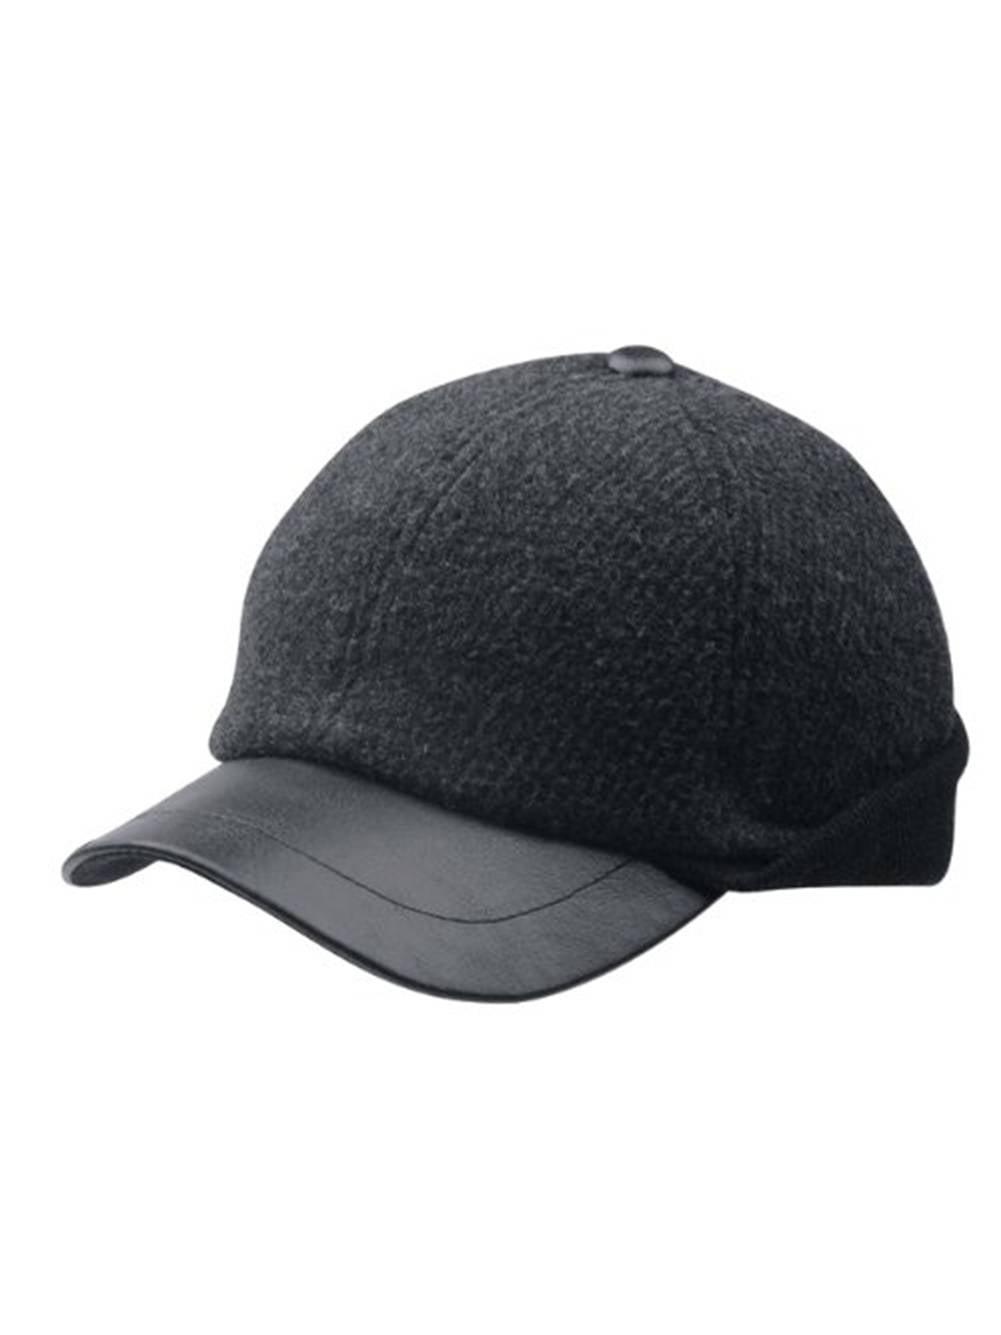 Wool Earflap Baseball Cap - Charcoal 3906c28949f